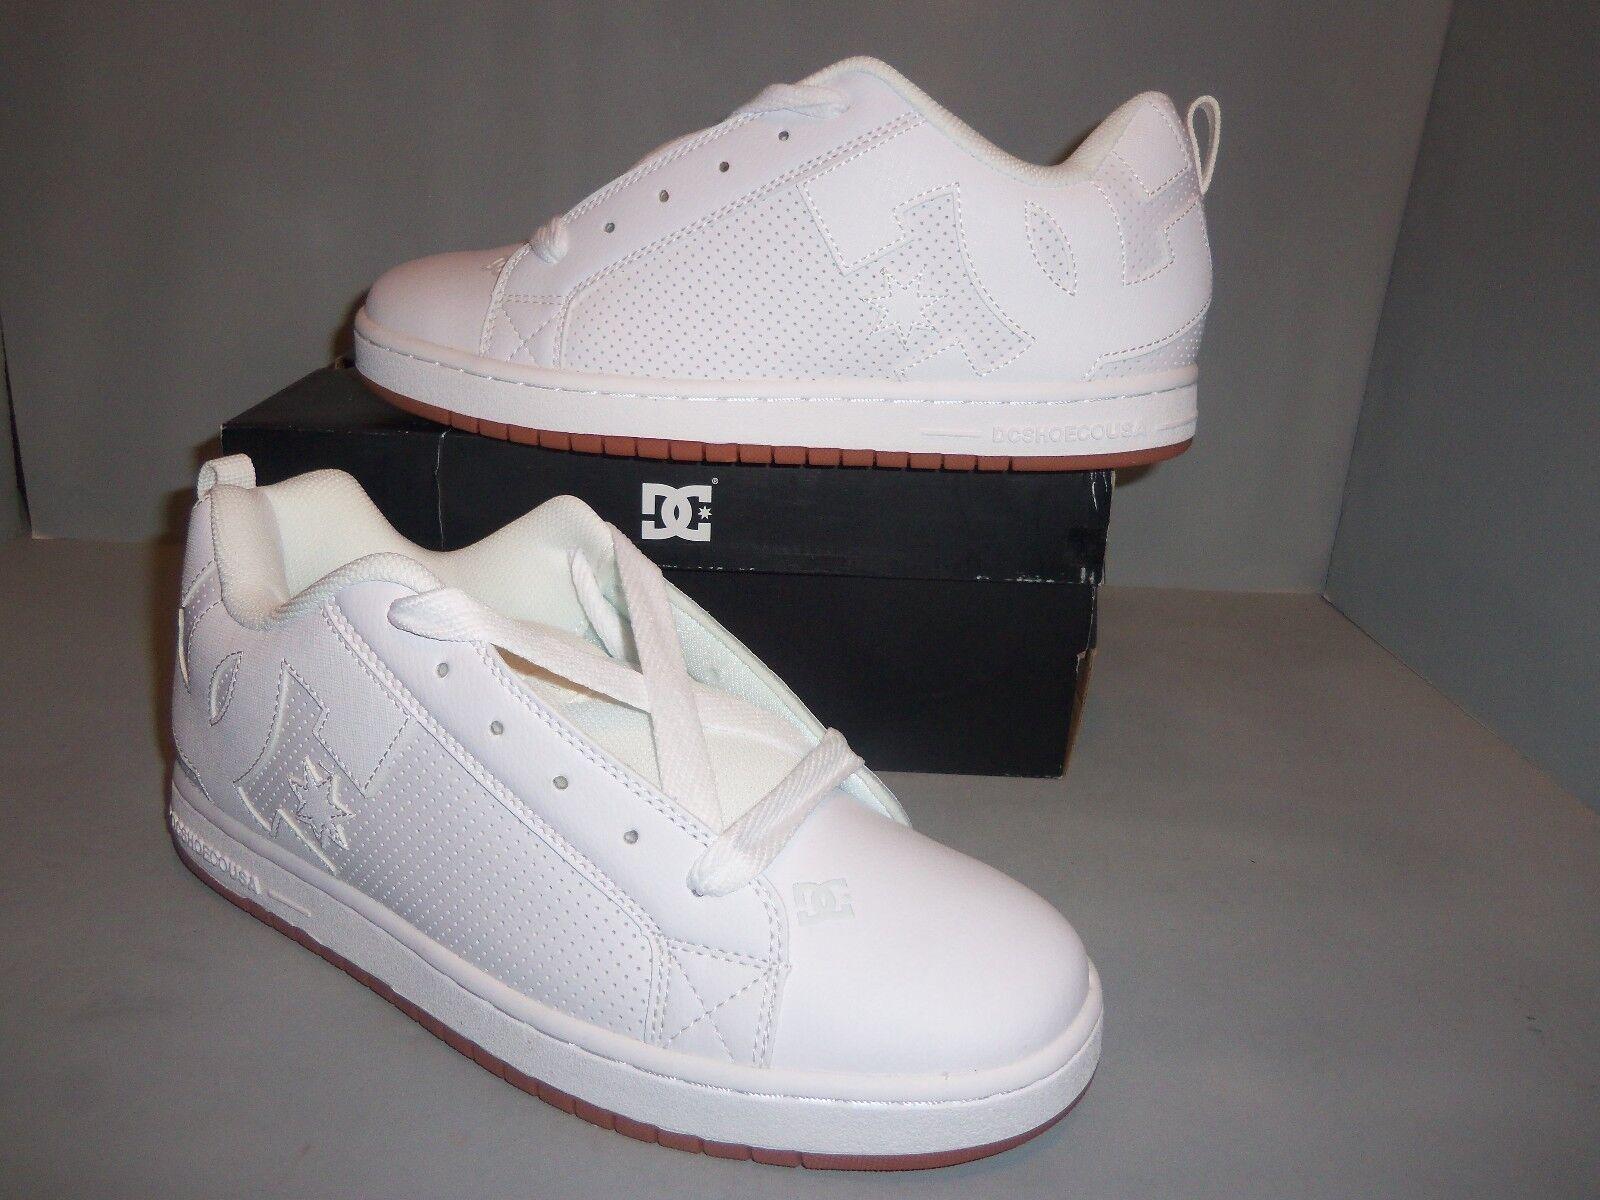 Mens DC Court Graffik Weiß Leather, Weiß & Gum Skate Skate Skate schuhe Größes   300529 NIB 6f90d8